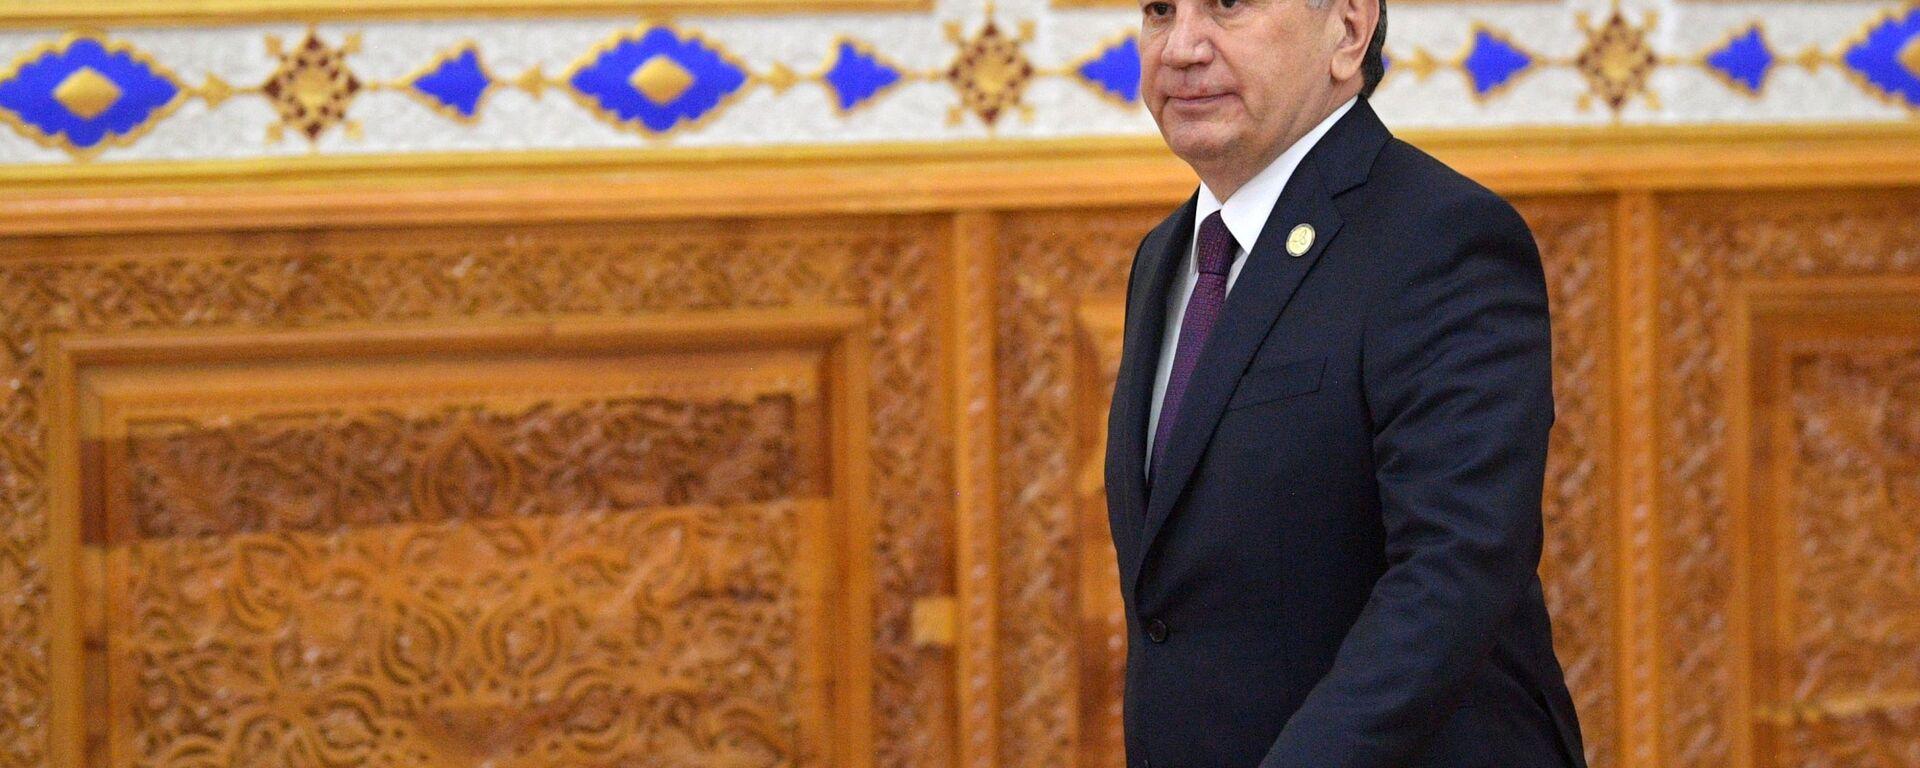 Президент Узбекистана Шавкат Мирзиеев - Sputnik Ўзбекистон, 1920, 23.08.2019